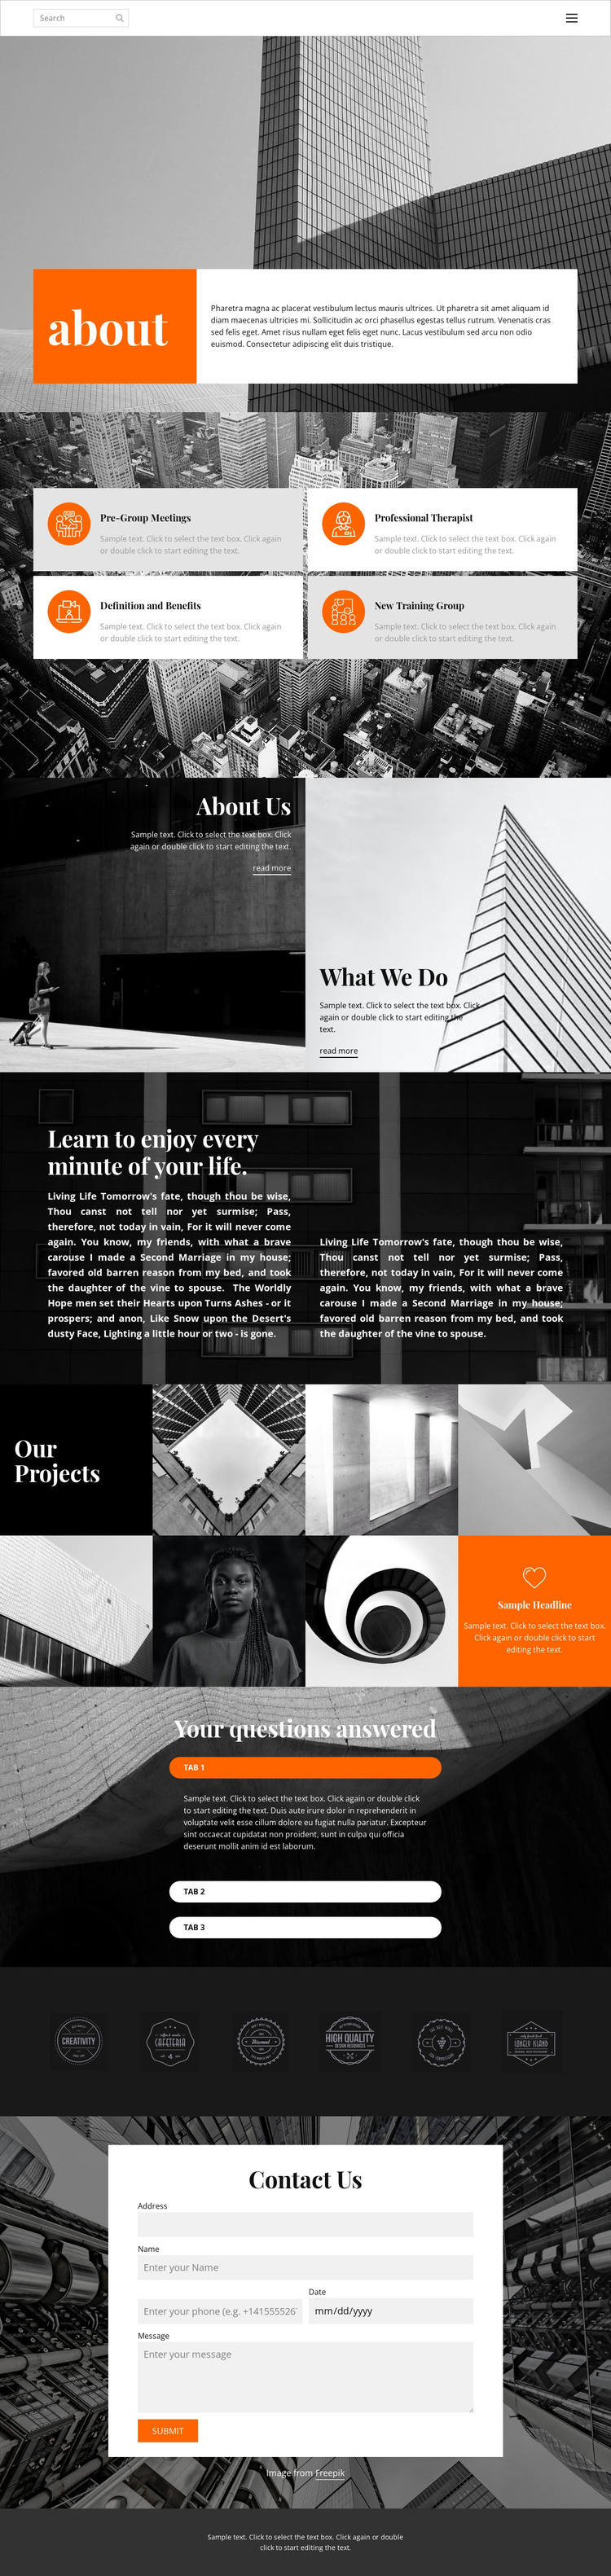 New projects studio Joomla Template